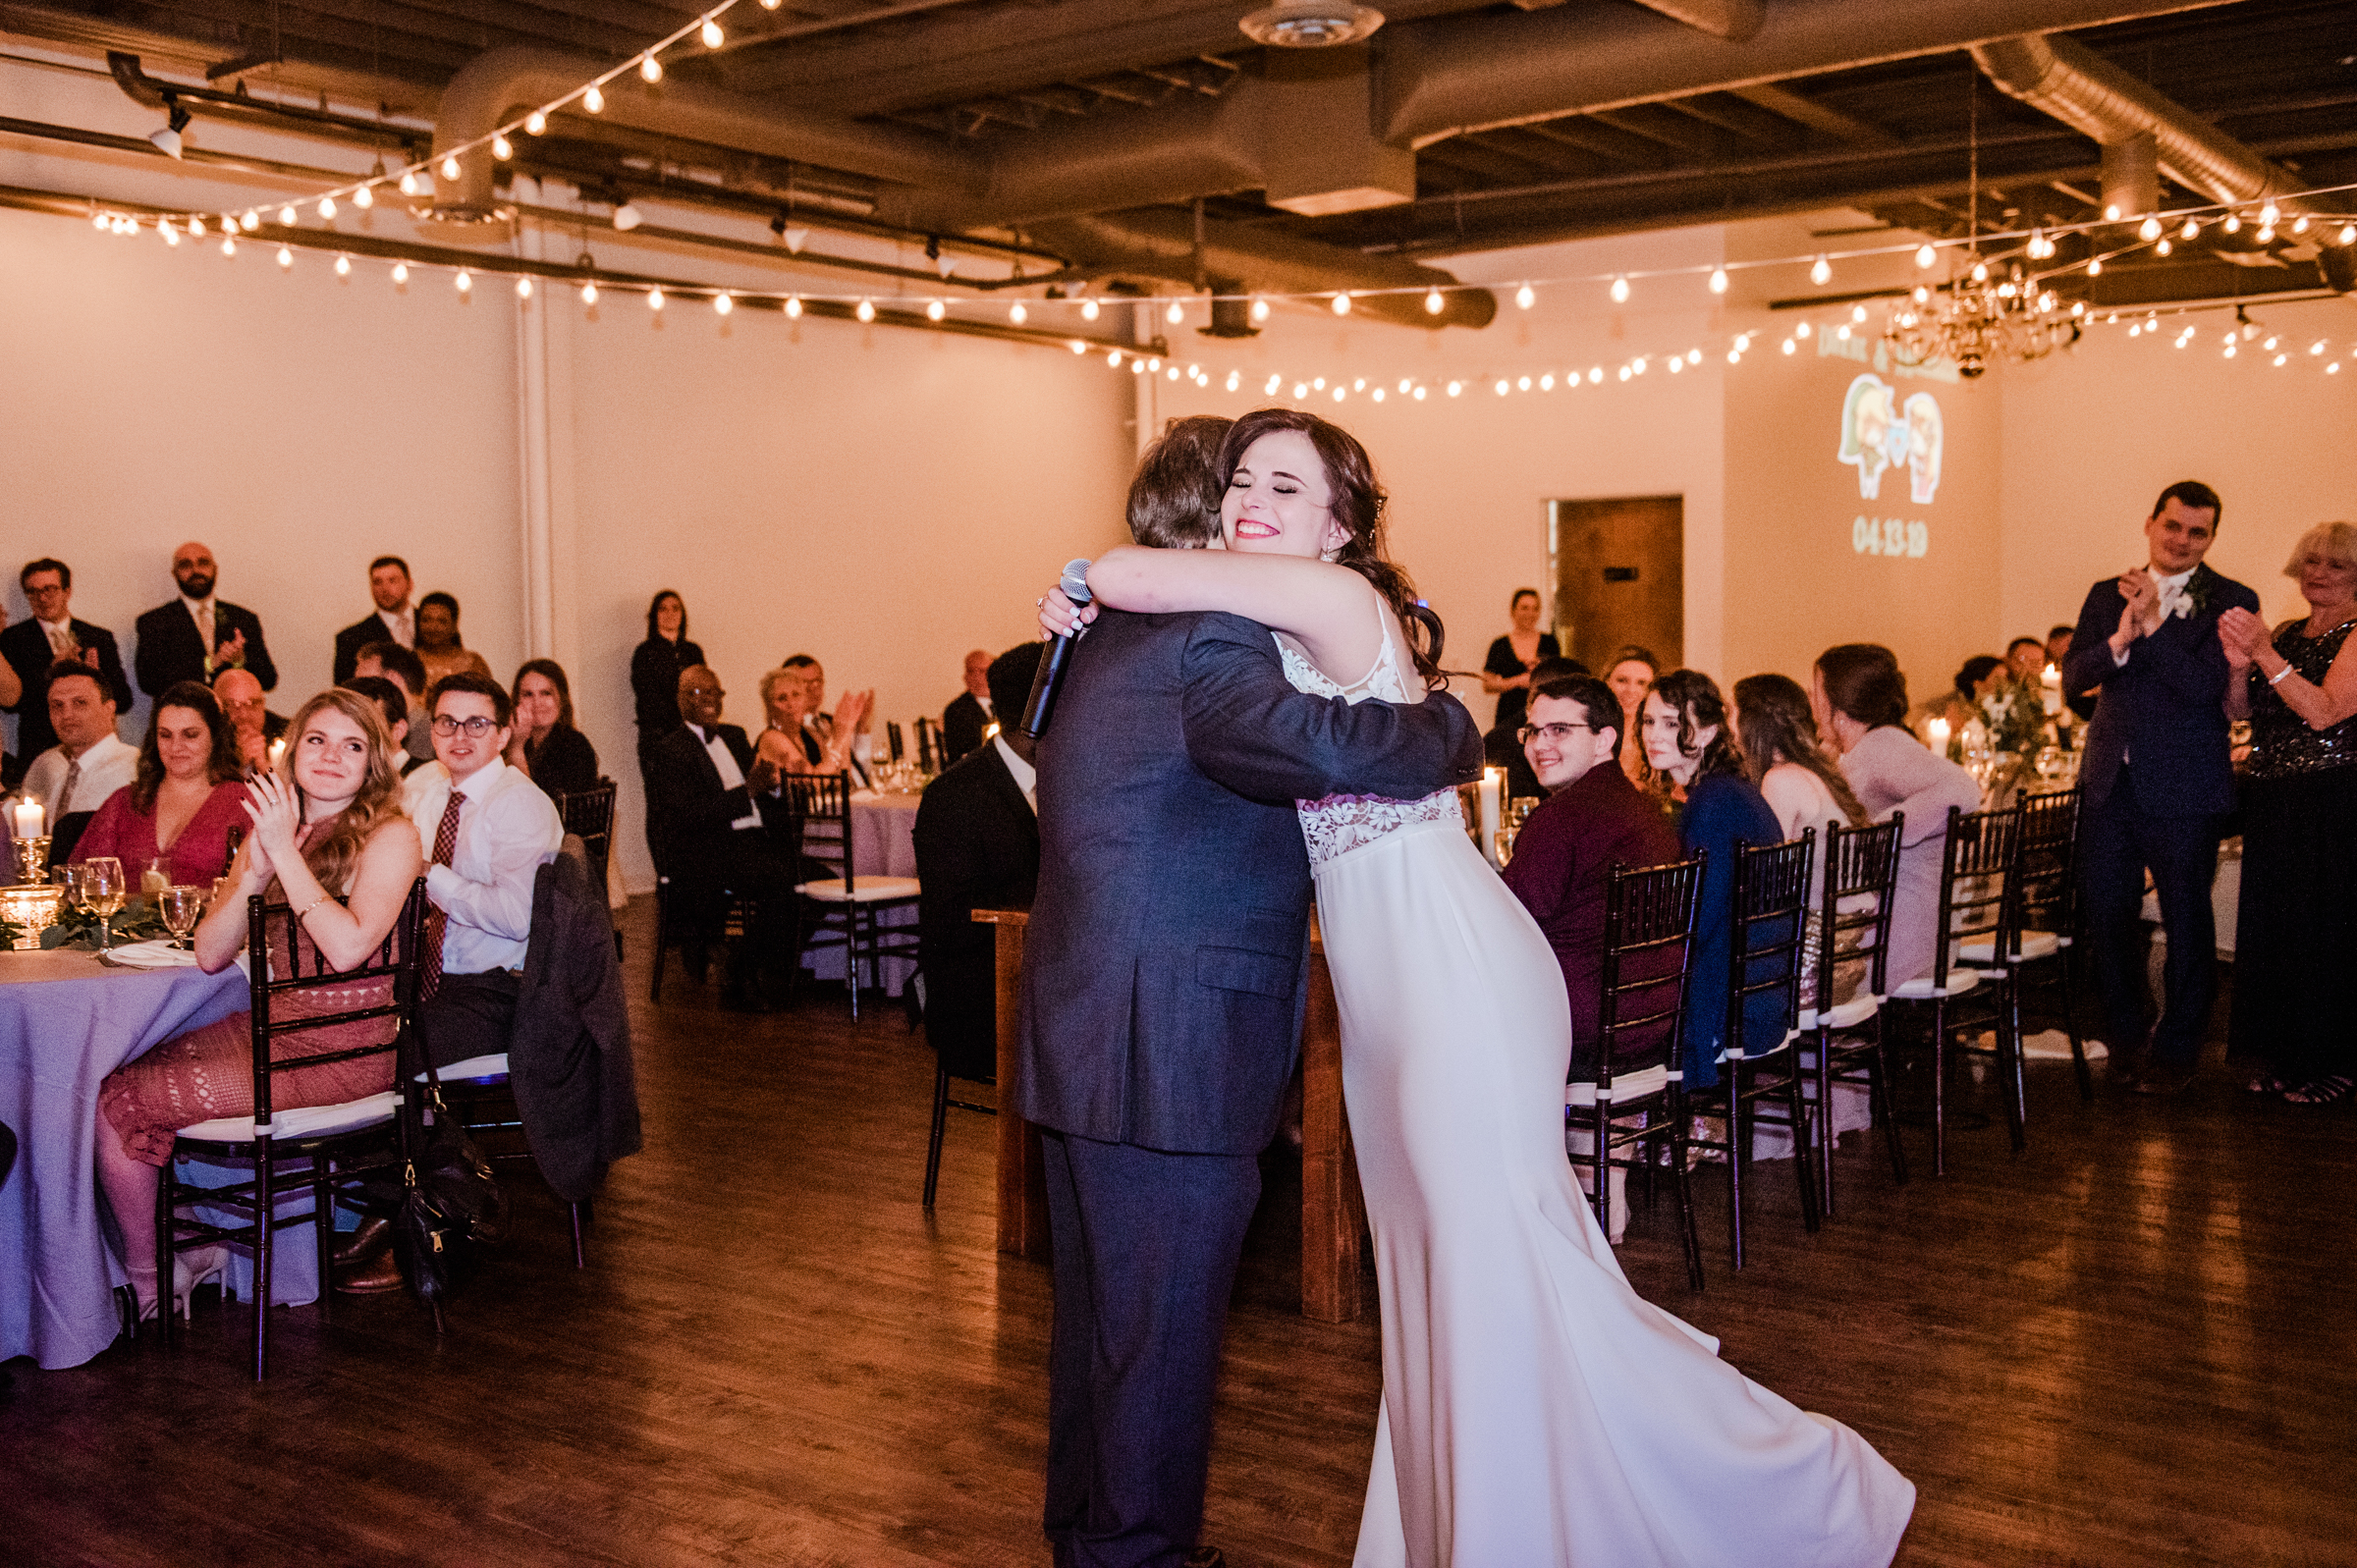 The_Arbor_LoftRochester_Wedding_JILL_STUDIO_Rochester_NY_Photographer_201555.jpg